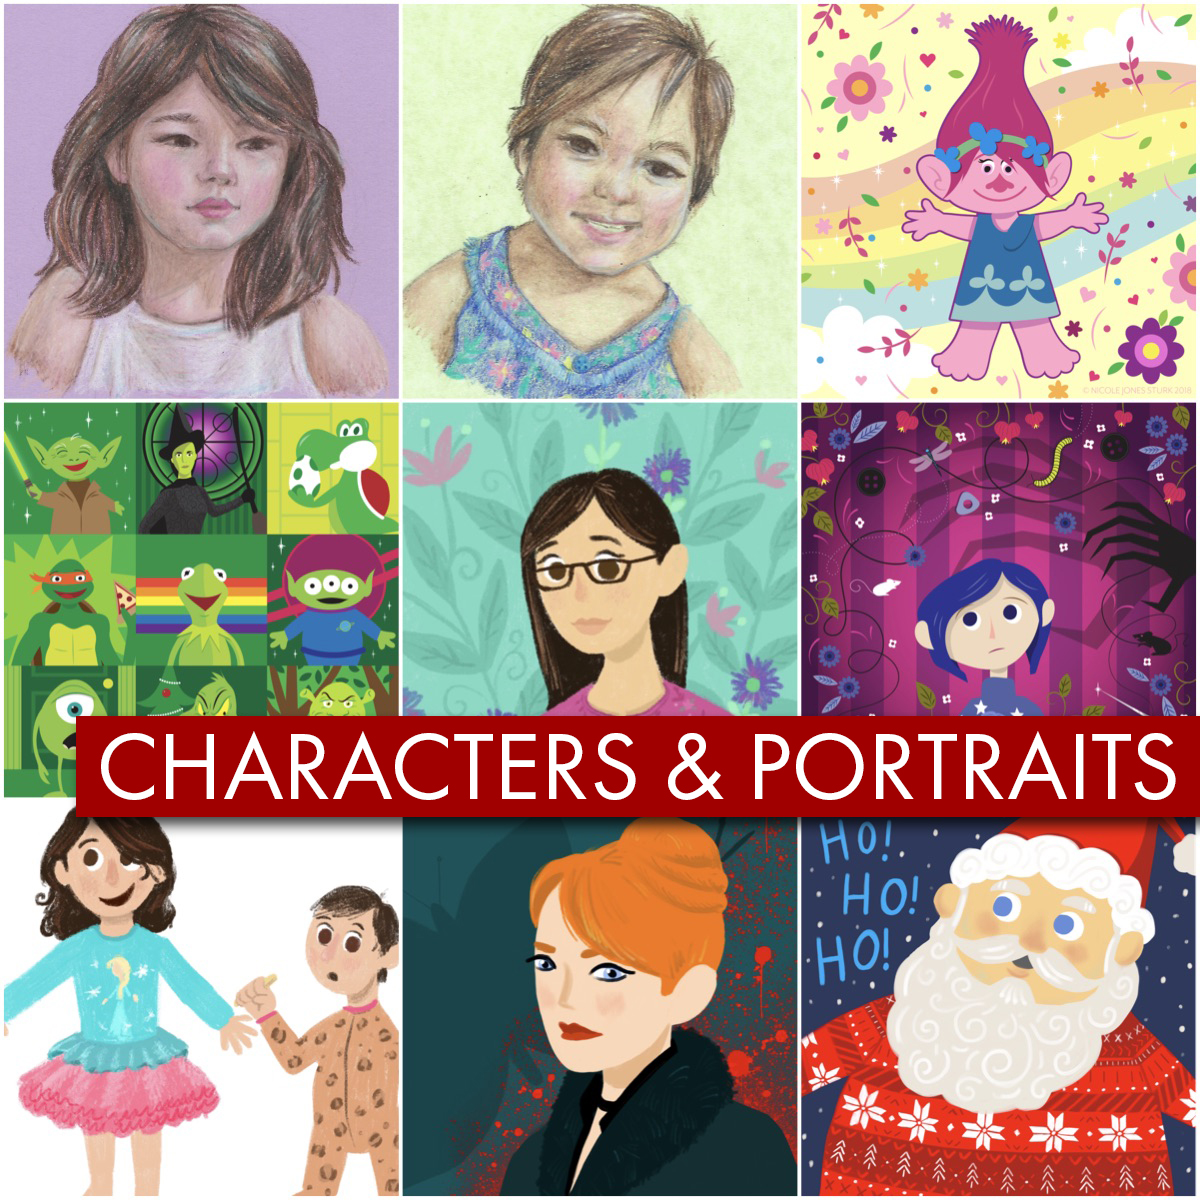 2018_characters_portraits.jpg